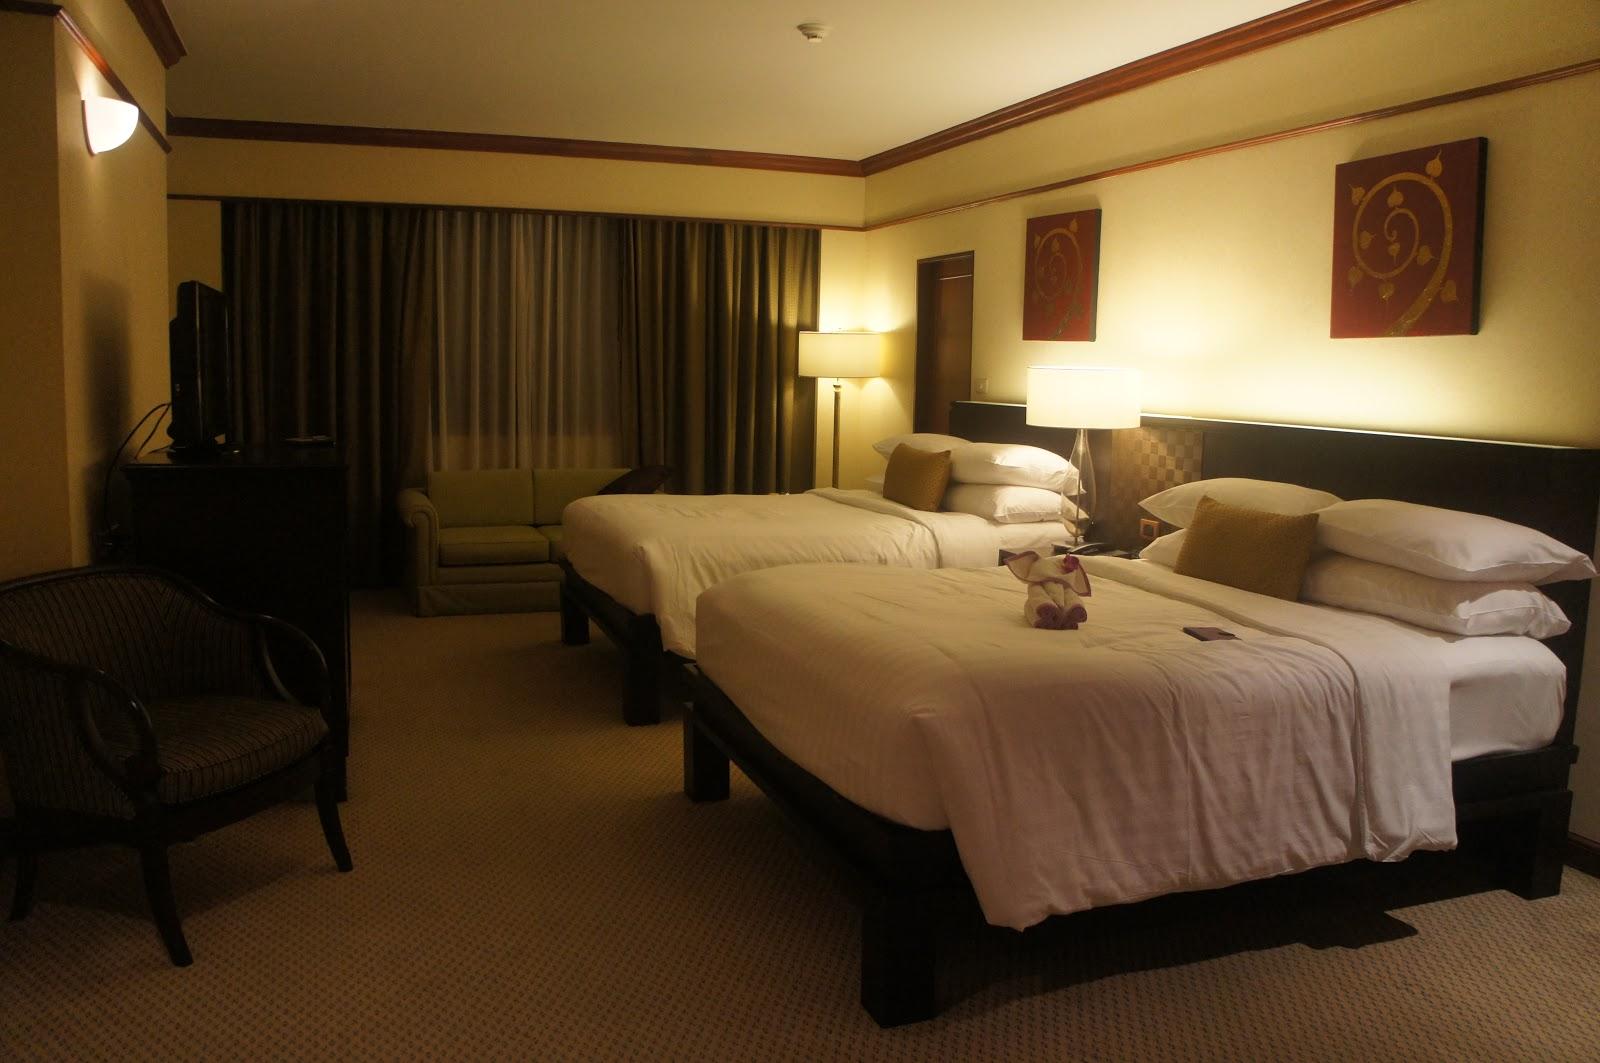 The Sukosol Hotel Bangkok: Where to Stay in Bangkok, Thailand